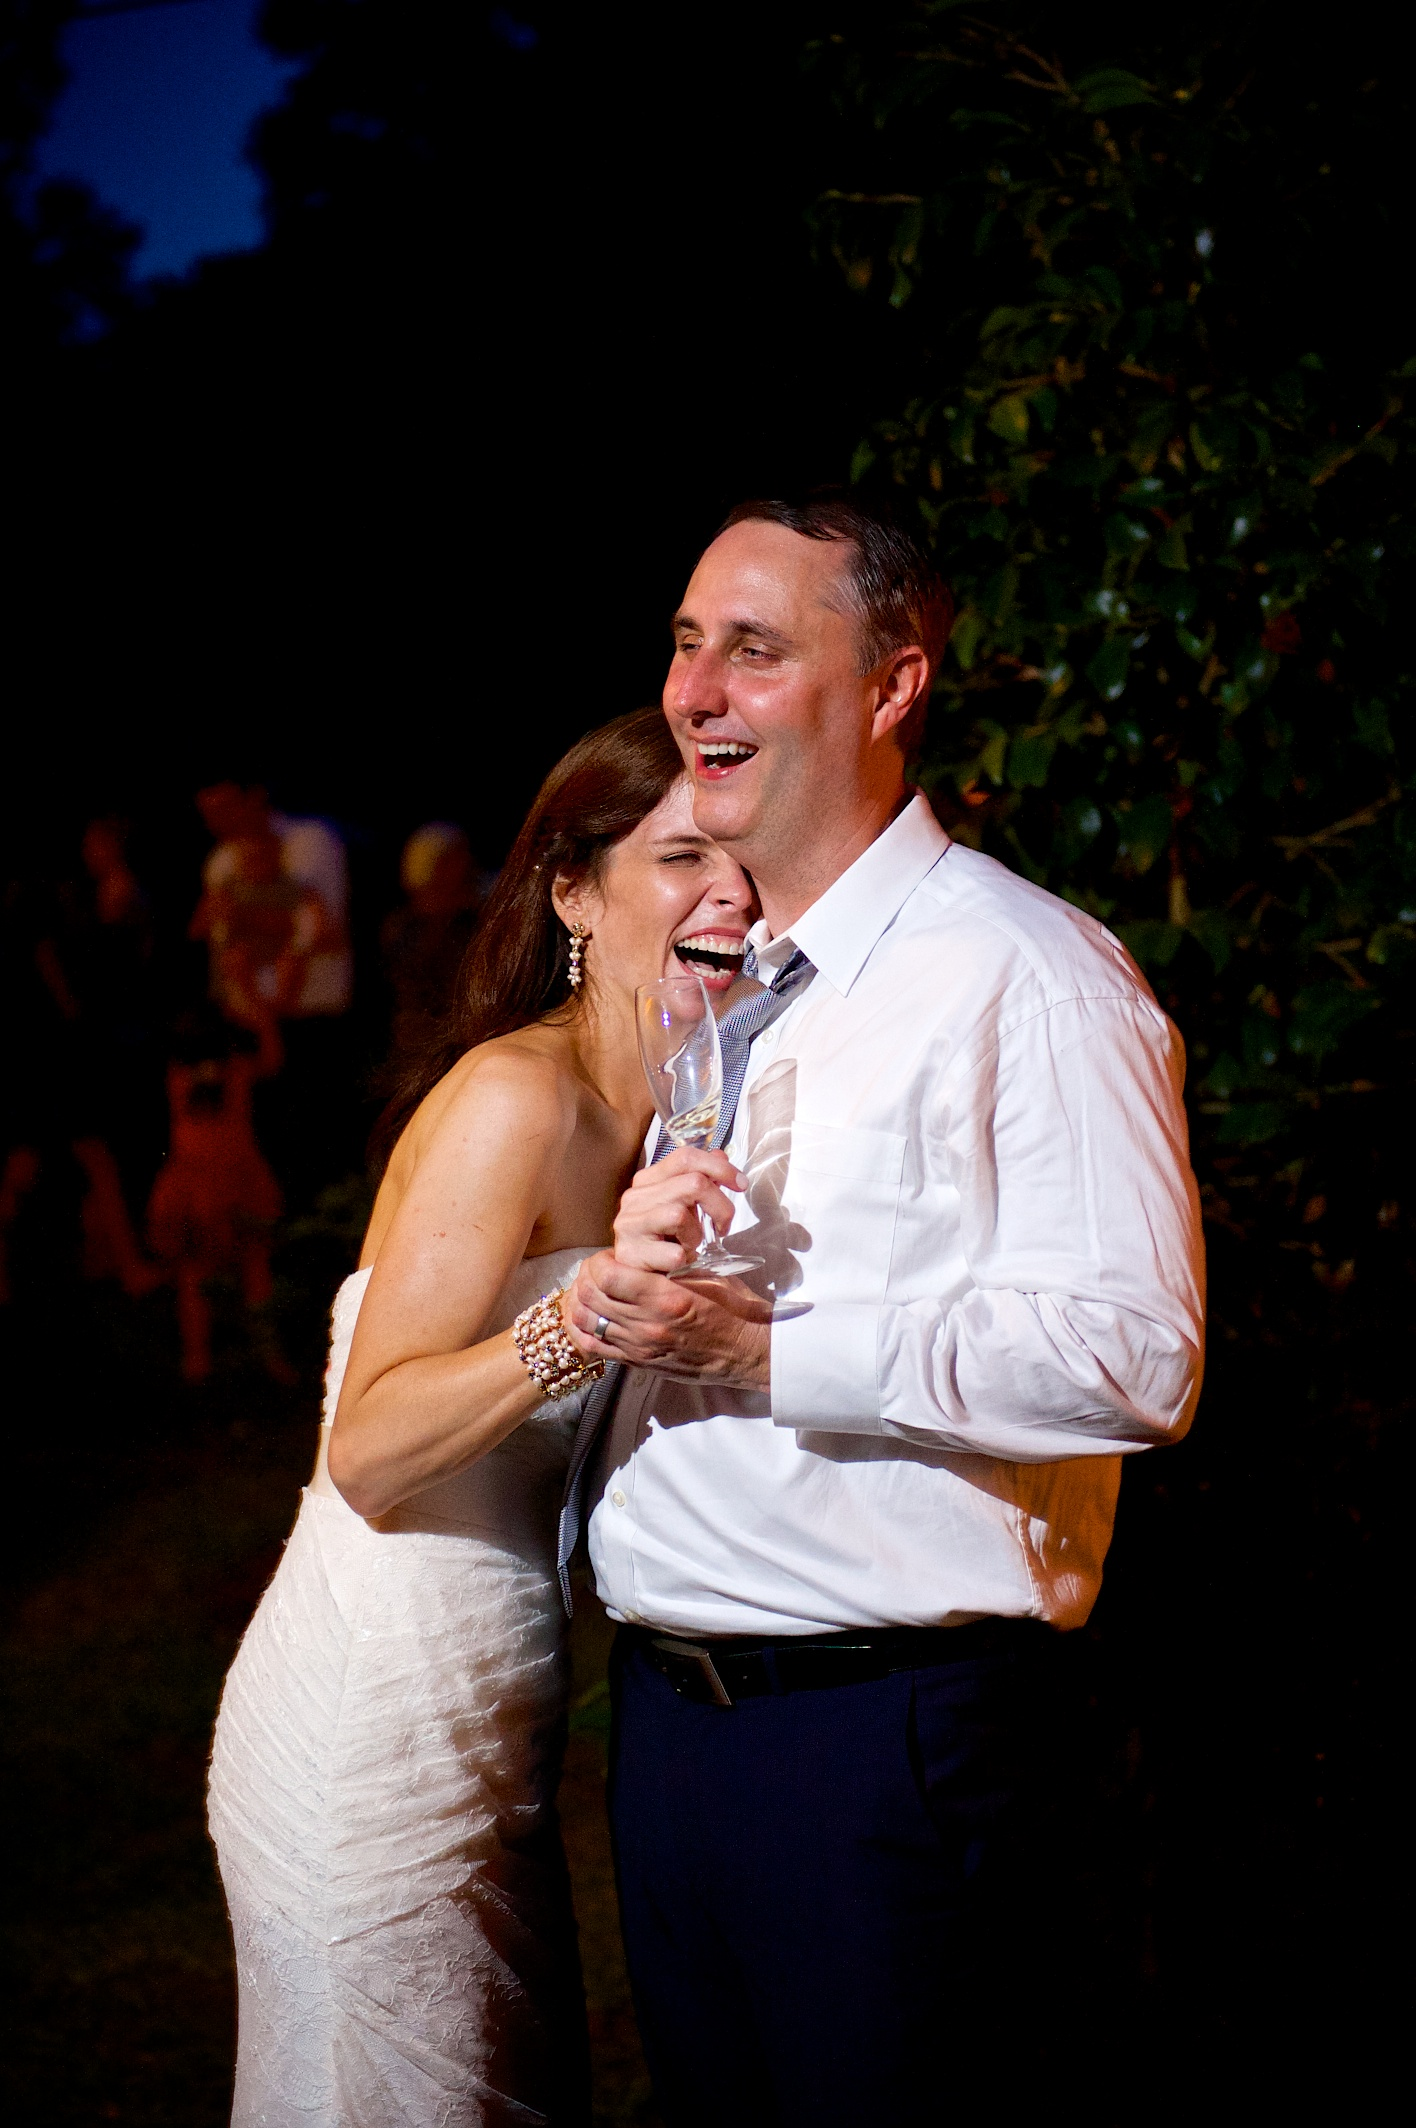 Lori and Scott's wedding in Fort Lawn, SC